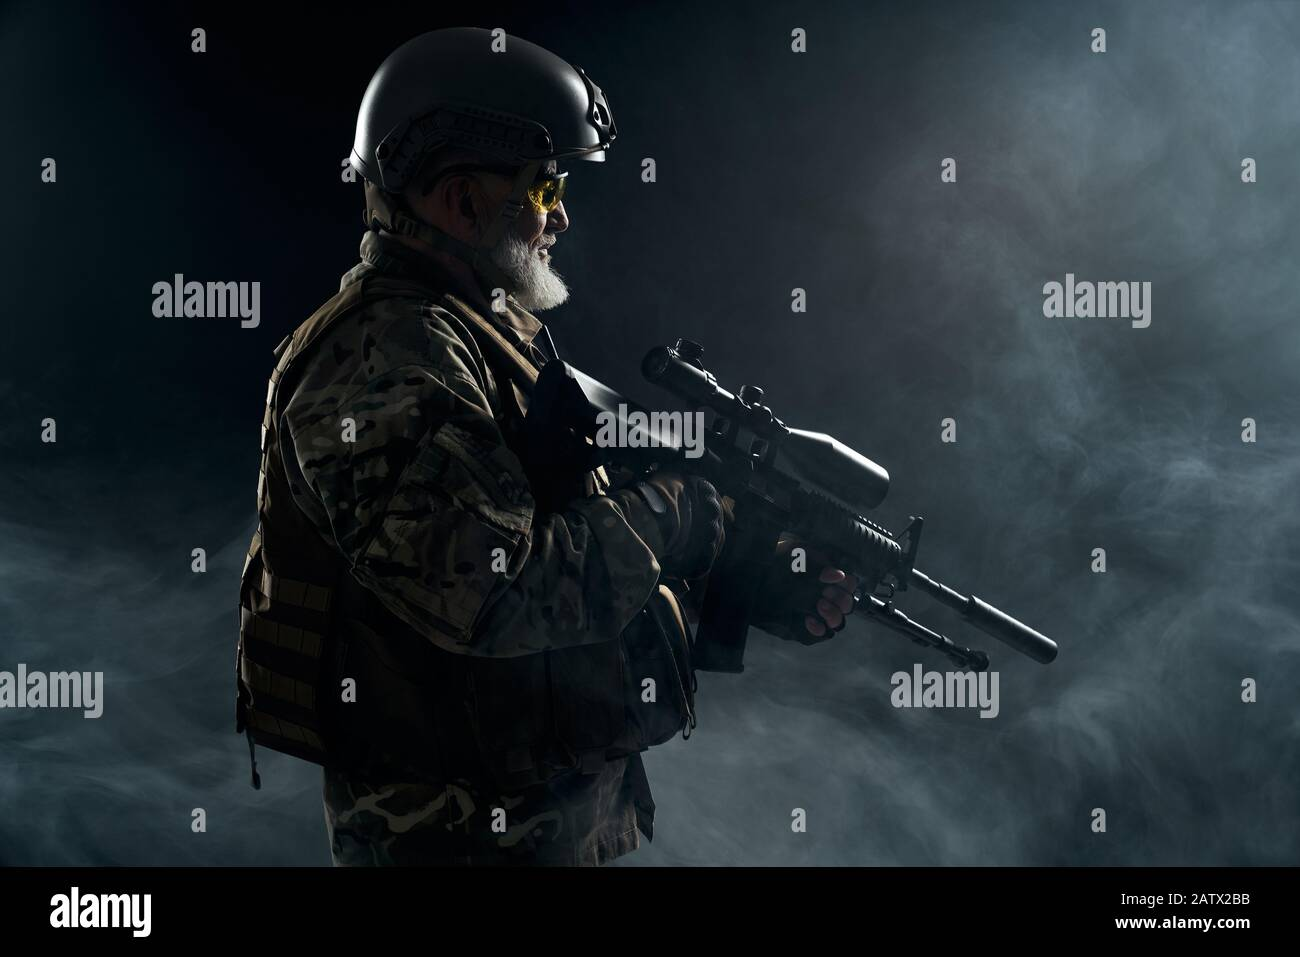 Walther PPK Pistol militaire effet vieilli T Shirt